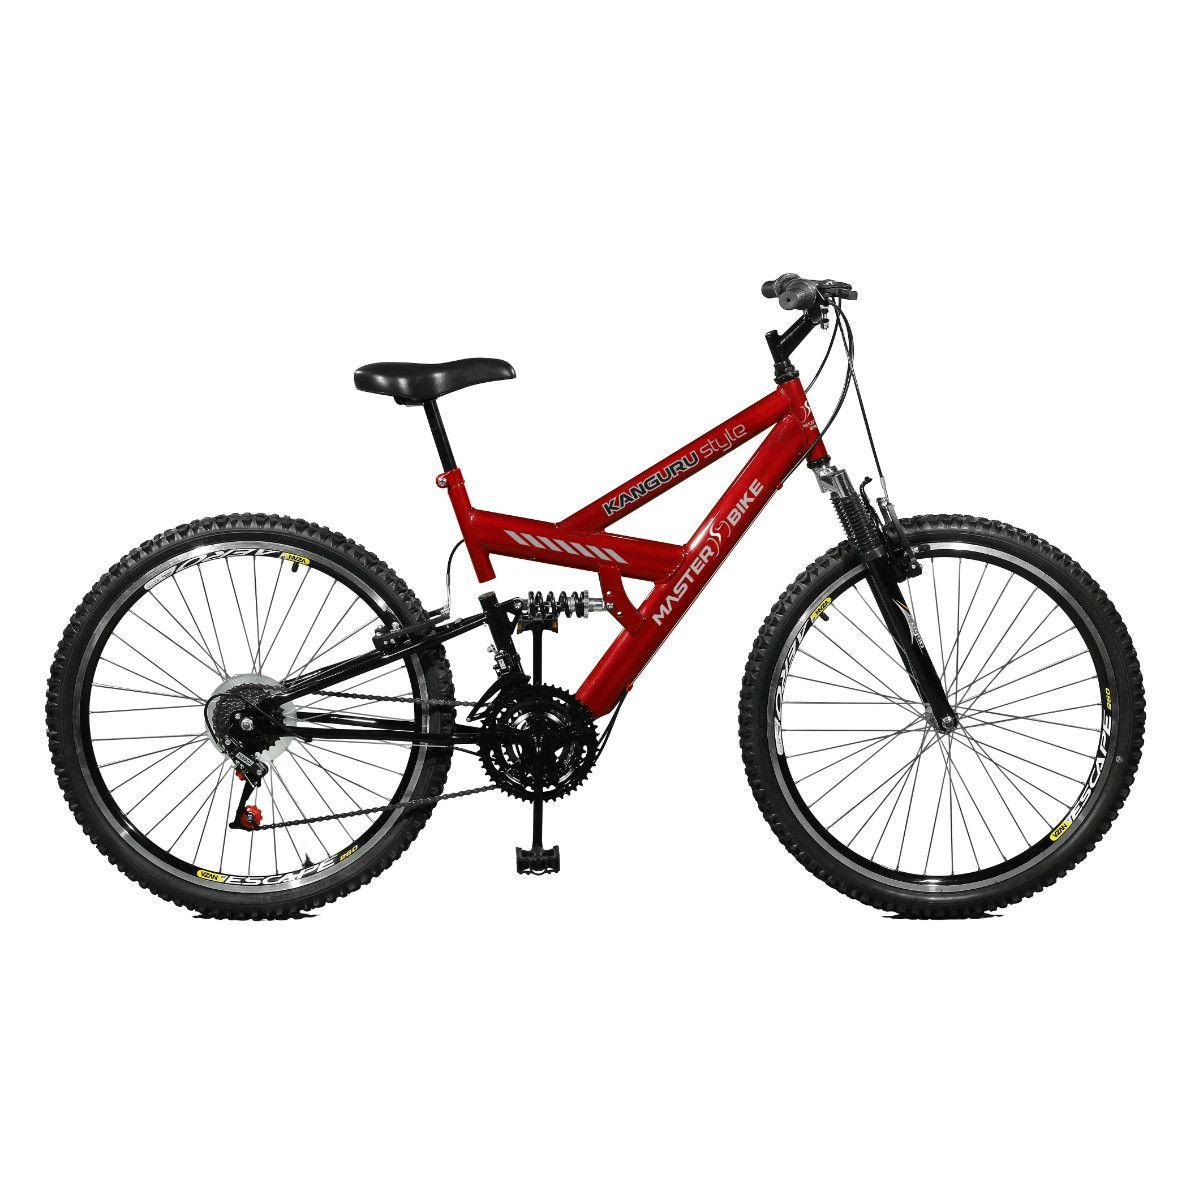 Bicicleta Master Bike Aro 26 Kanguru Style 21 Marchas A-36 V-Brake Vermelho/Preto